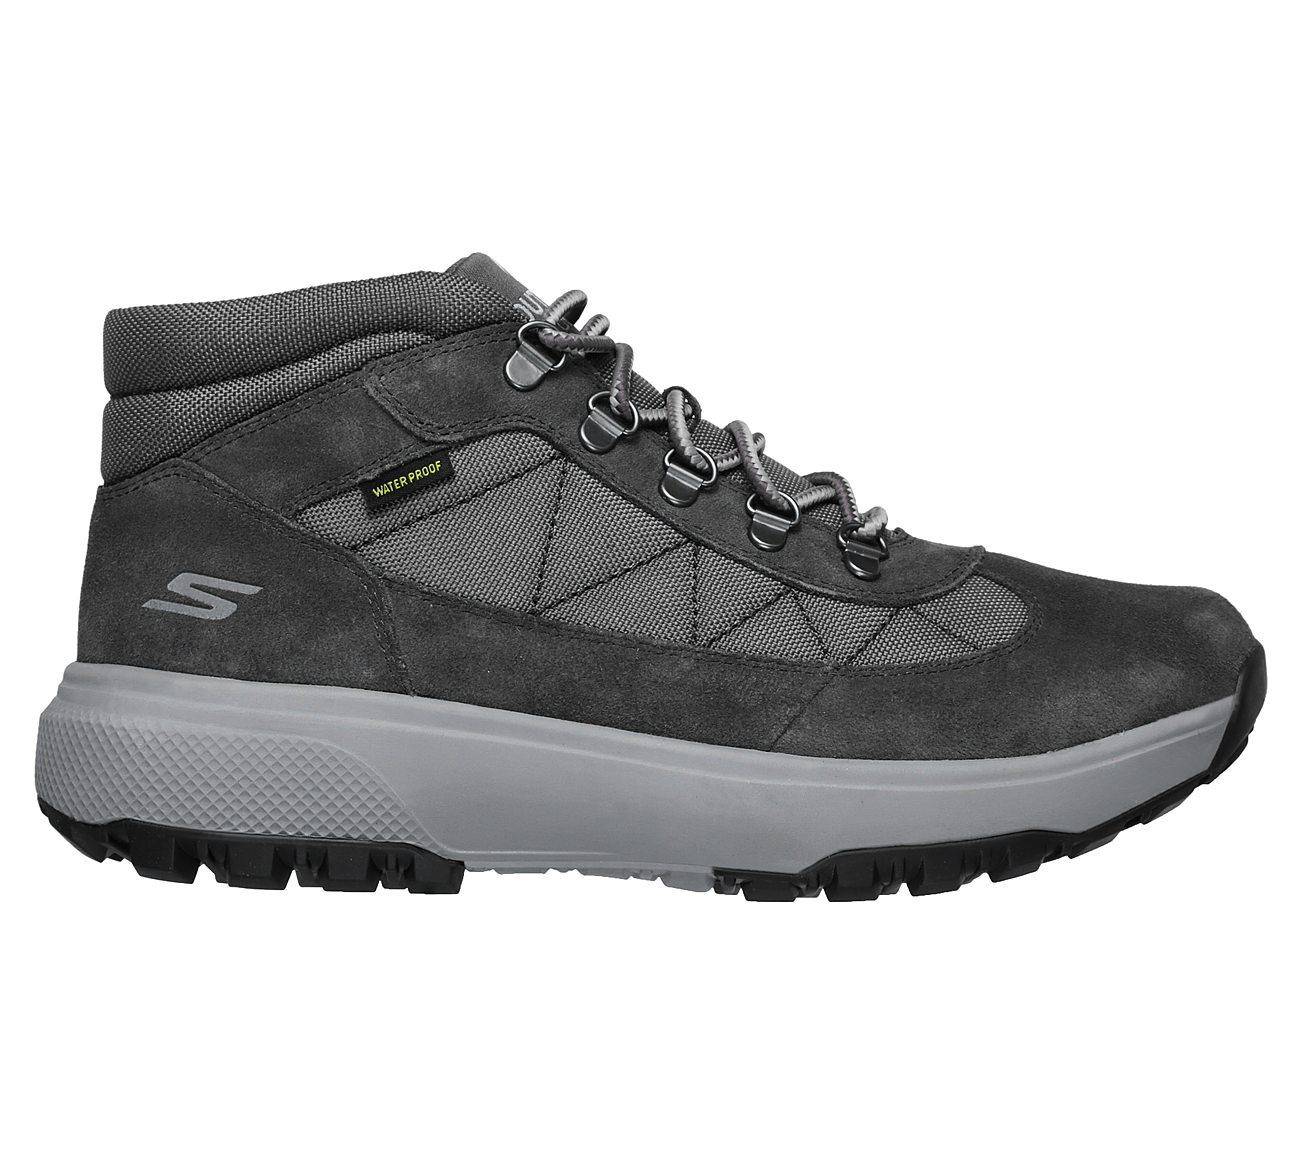 ef5e9872a95 Men's Shoes Skechers Go Outdoors Ultra Adventures Shoes Mens Trail ...